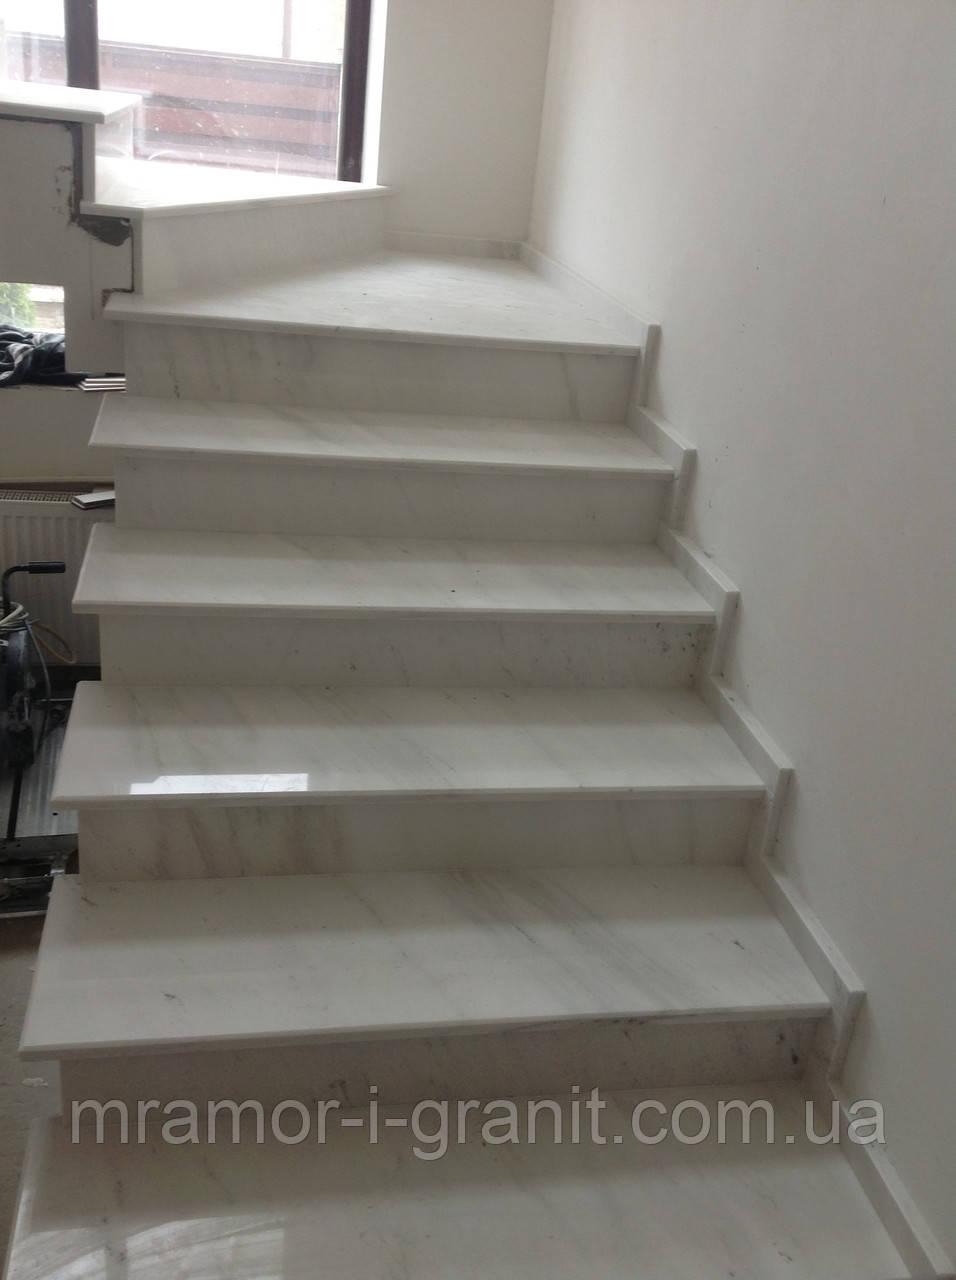 Мраморные лестницы, фото 1